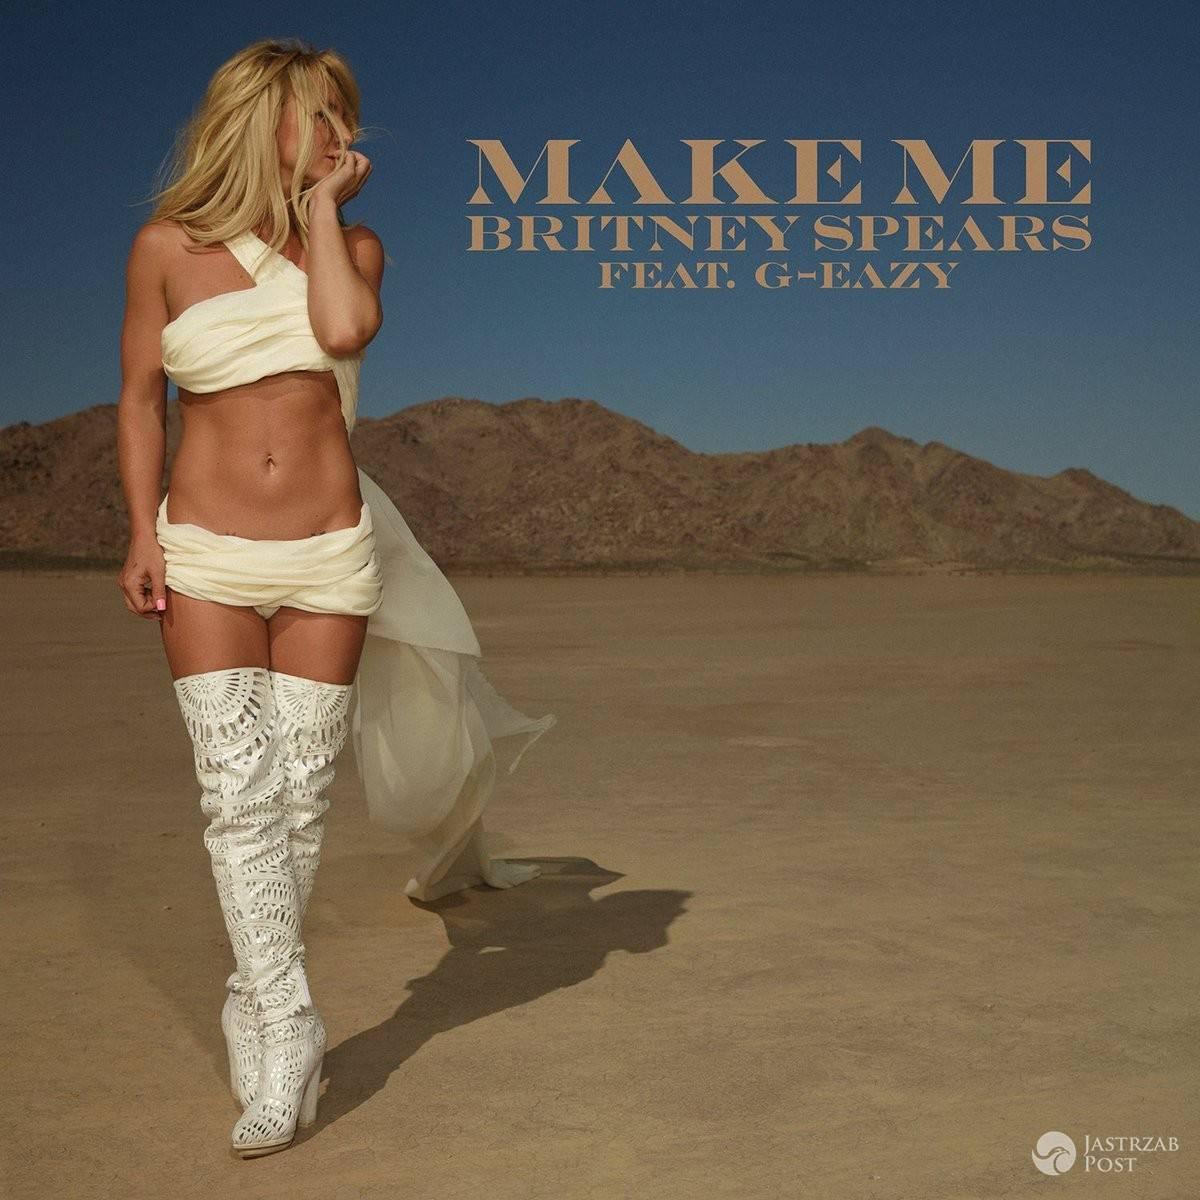 Britney Spears Make Me piosenka, tekst, okładka singla, mp3